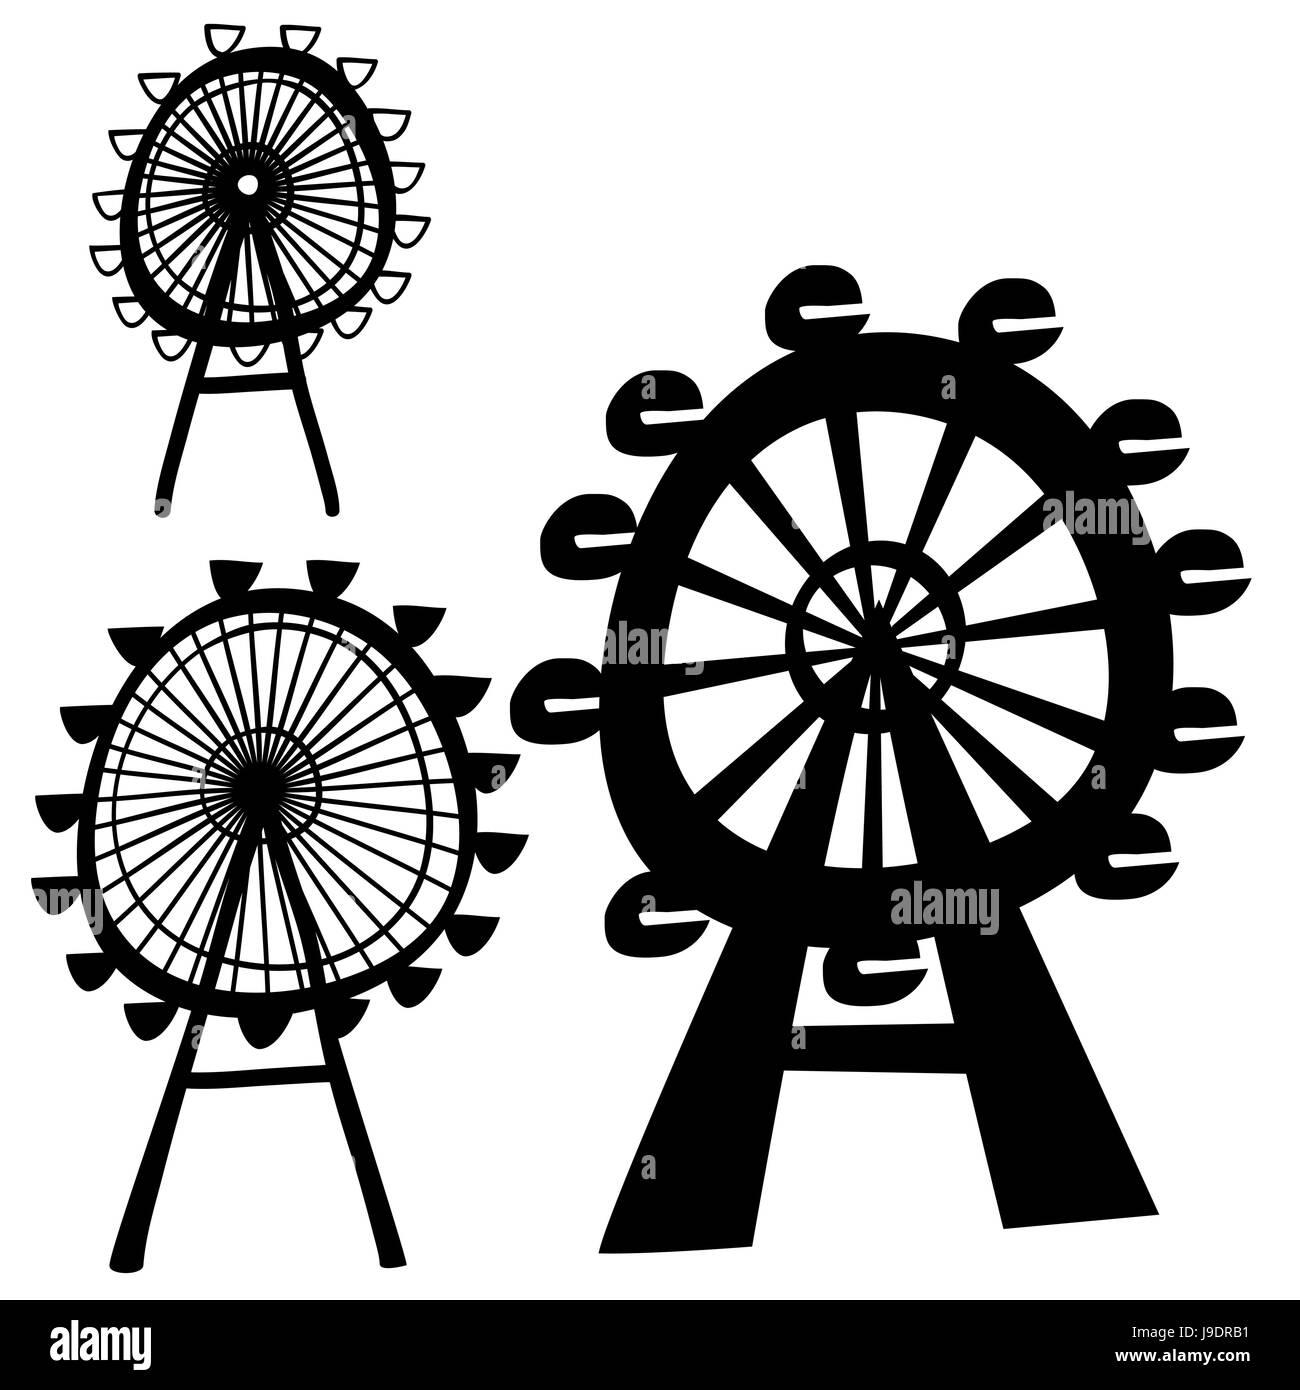 famous, london, eye, sign, landmark, logo, pictogram, symbol, pictograph, trade - Stock Image